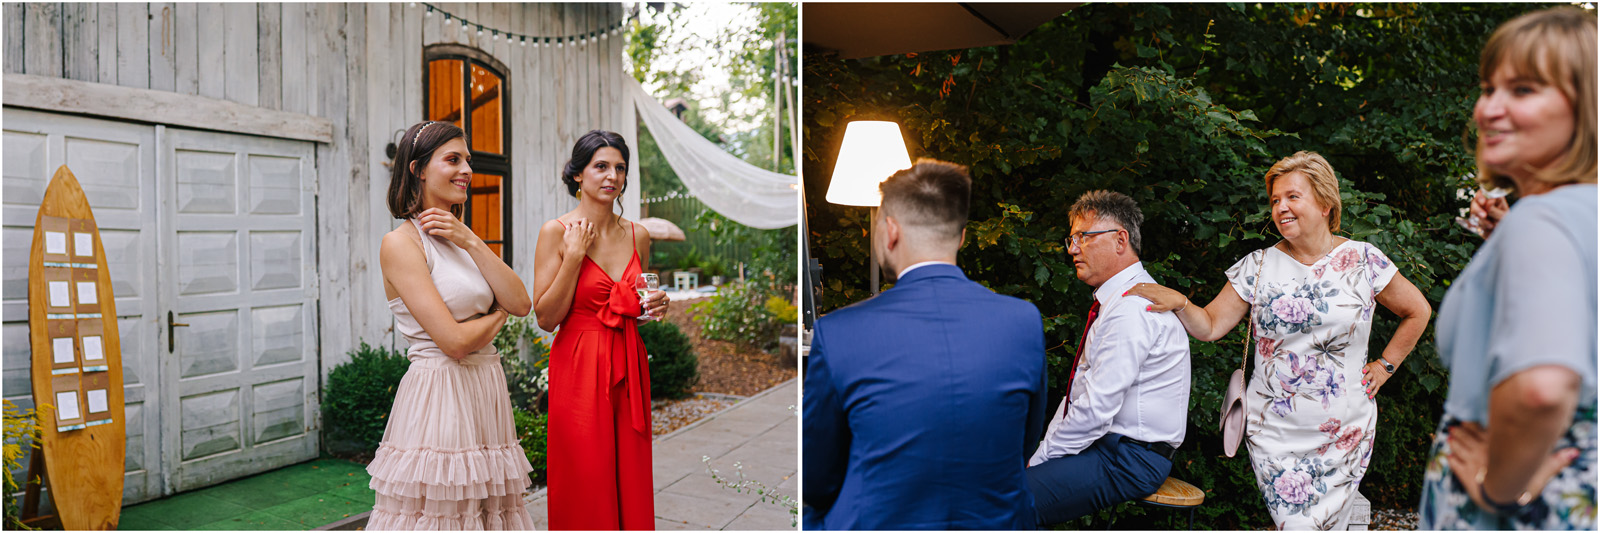 Ania & Mateusz | boho wesele w Stodole pod Kasztanami 98